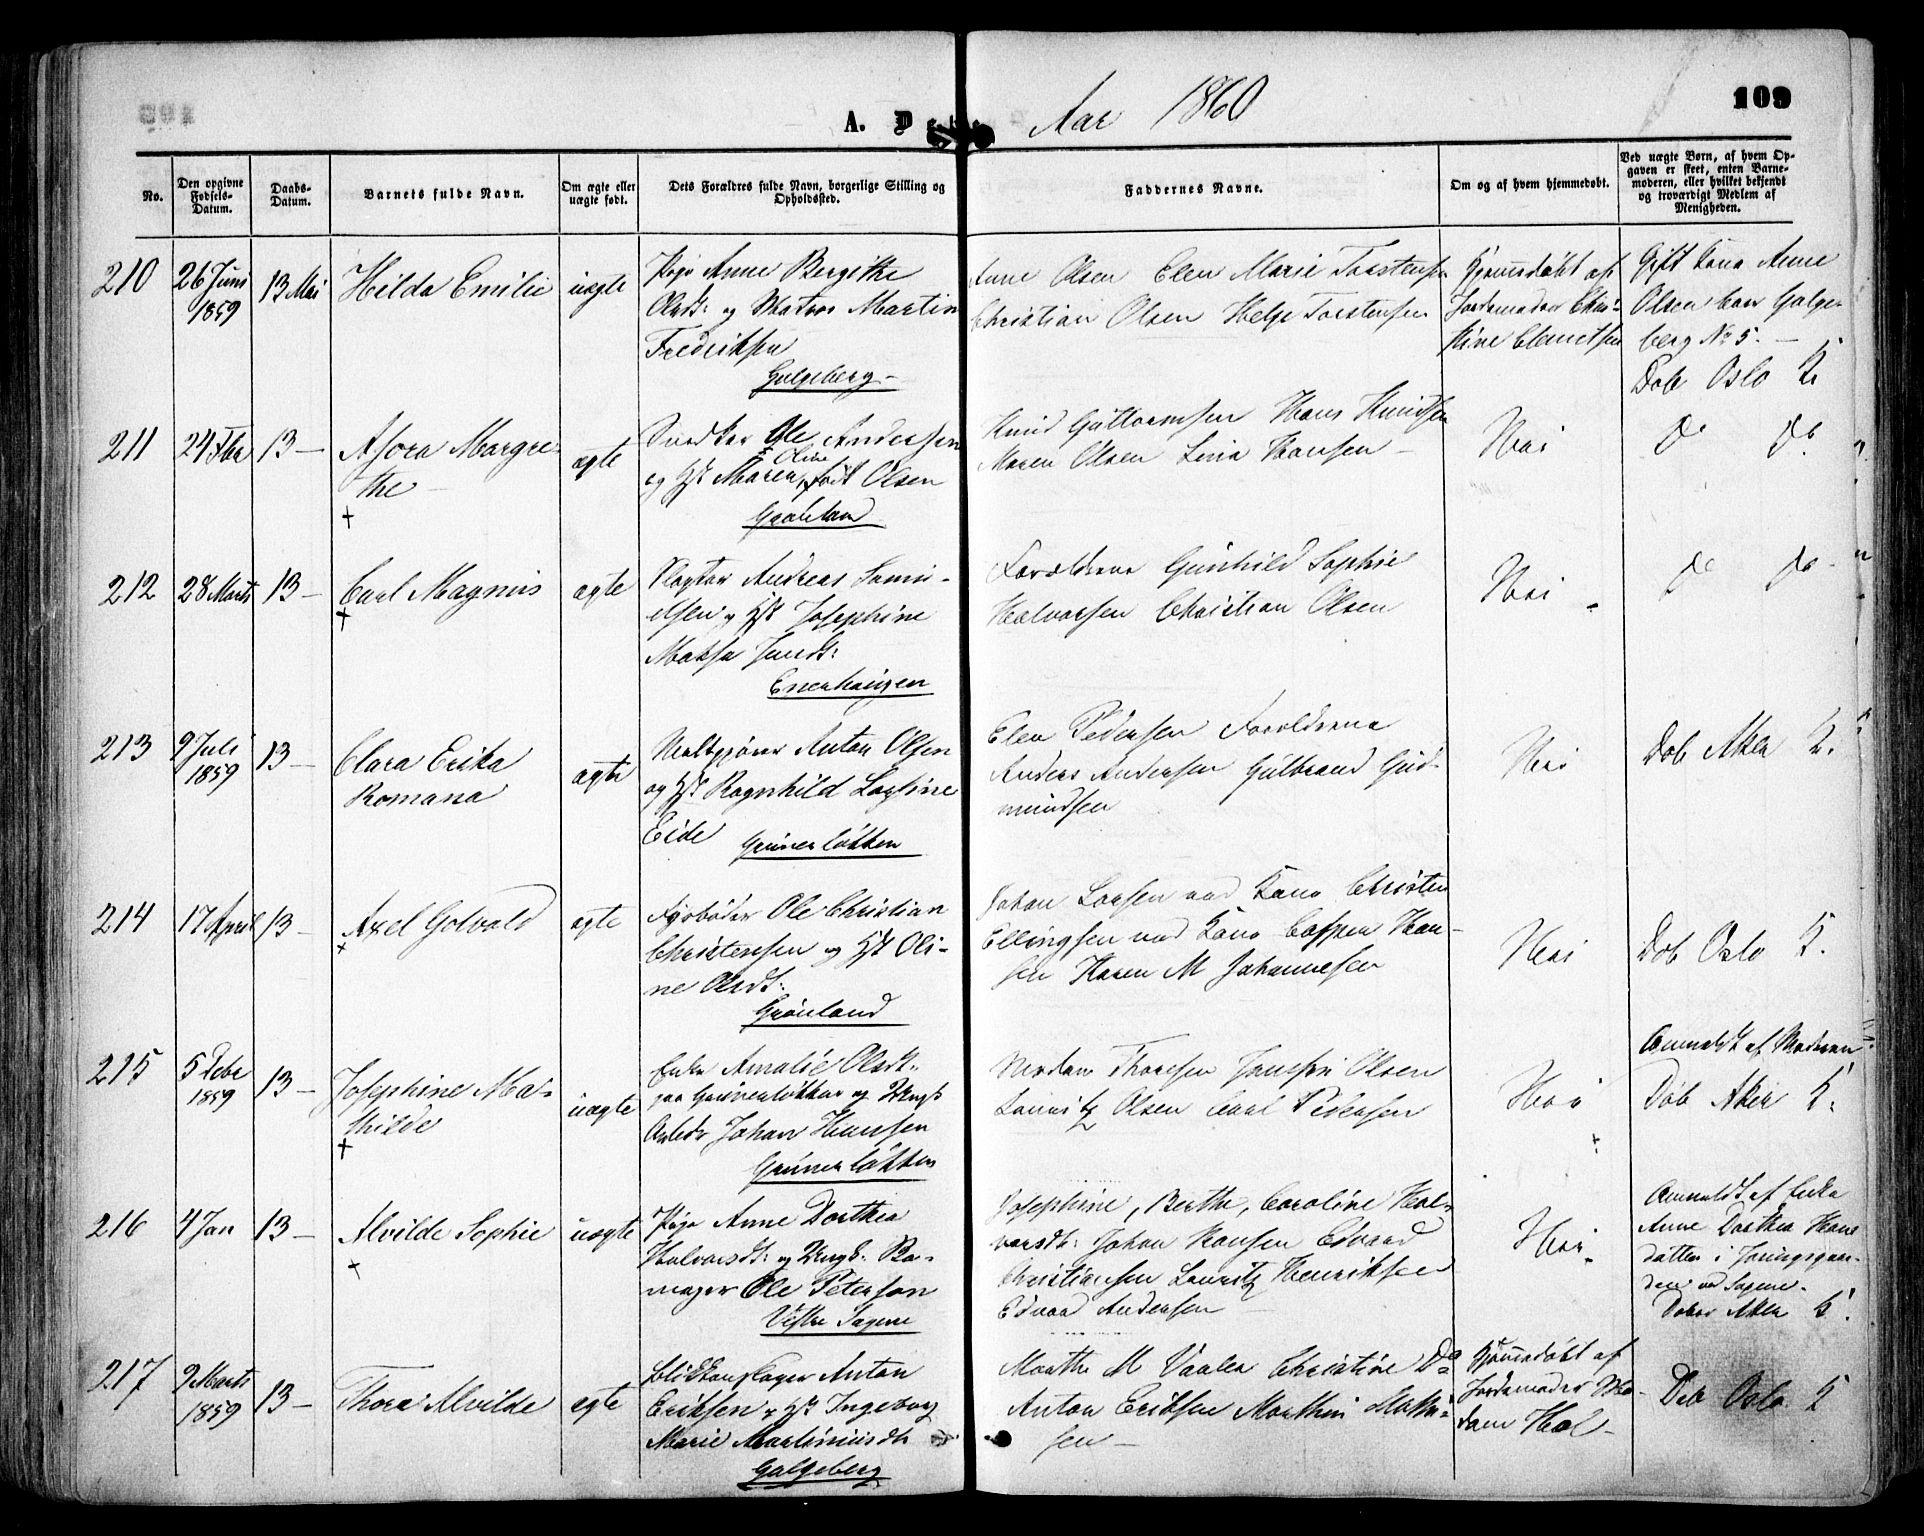 SAO, Grønland prestekontor Kirkebøker, F/Fa/L0001: Ministerialbok nr. 1, 1859-1861, s. 109